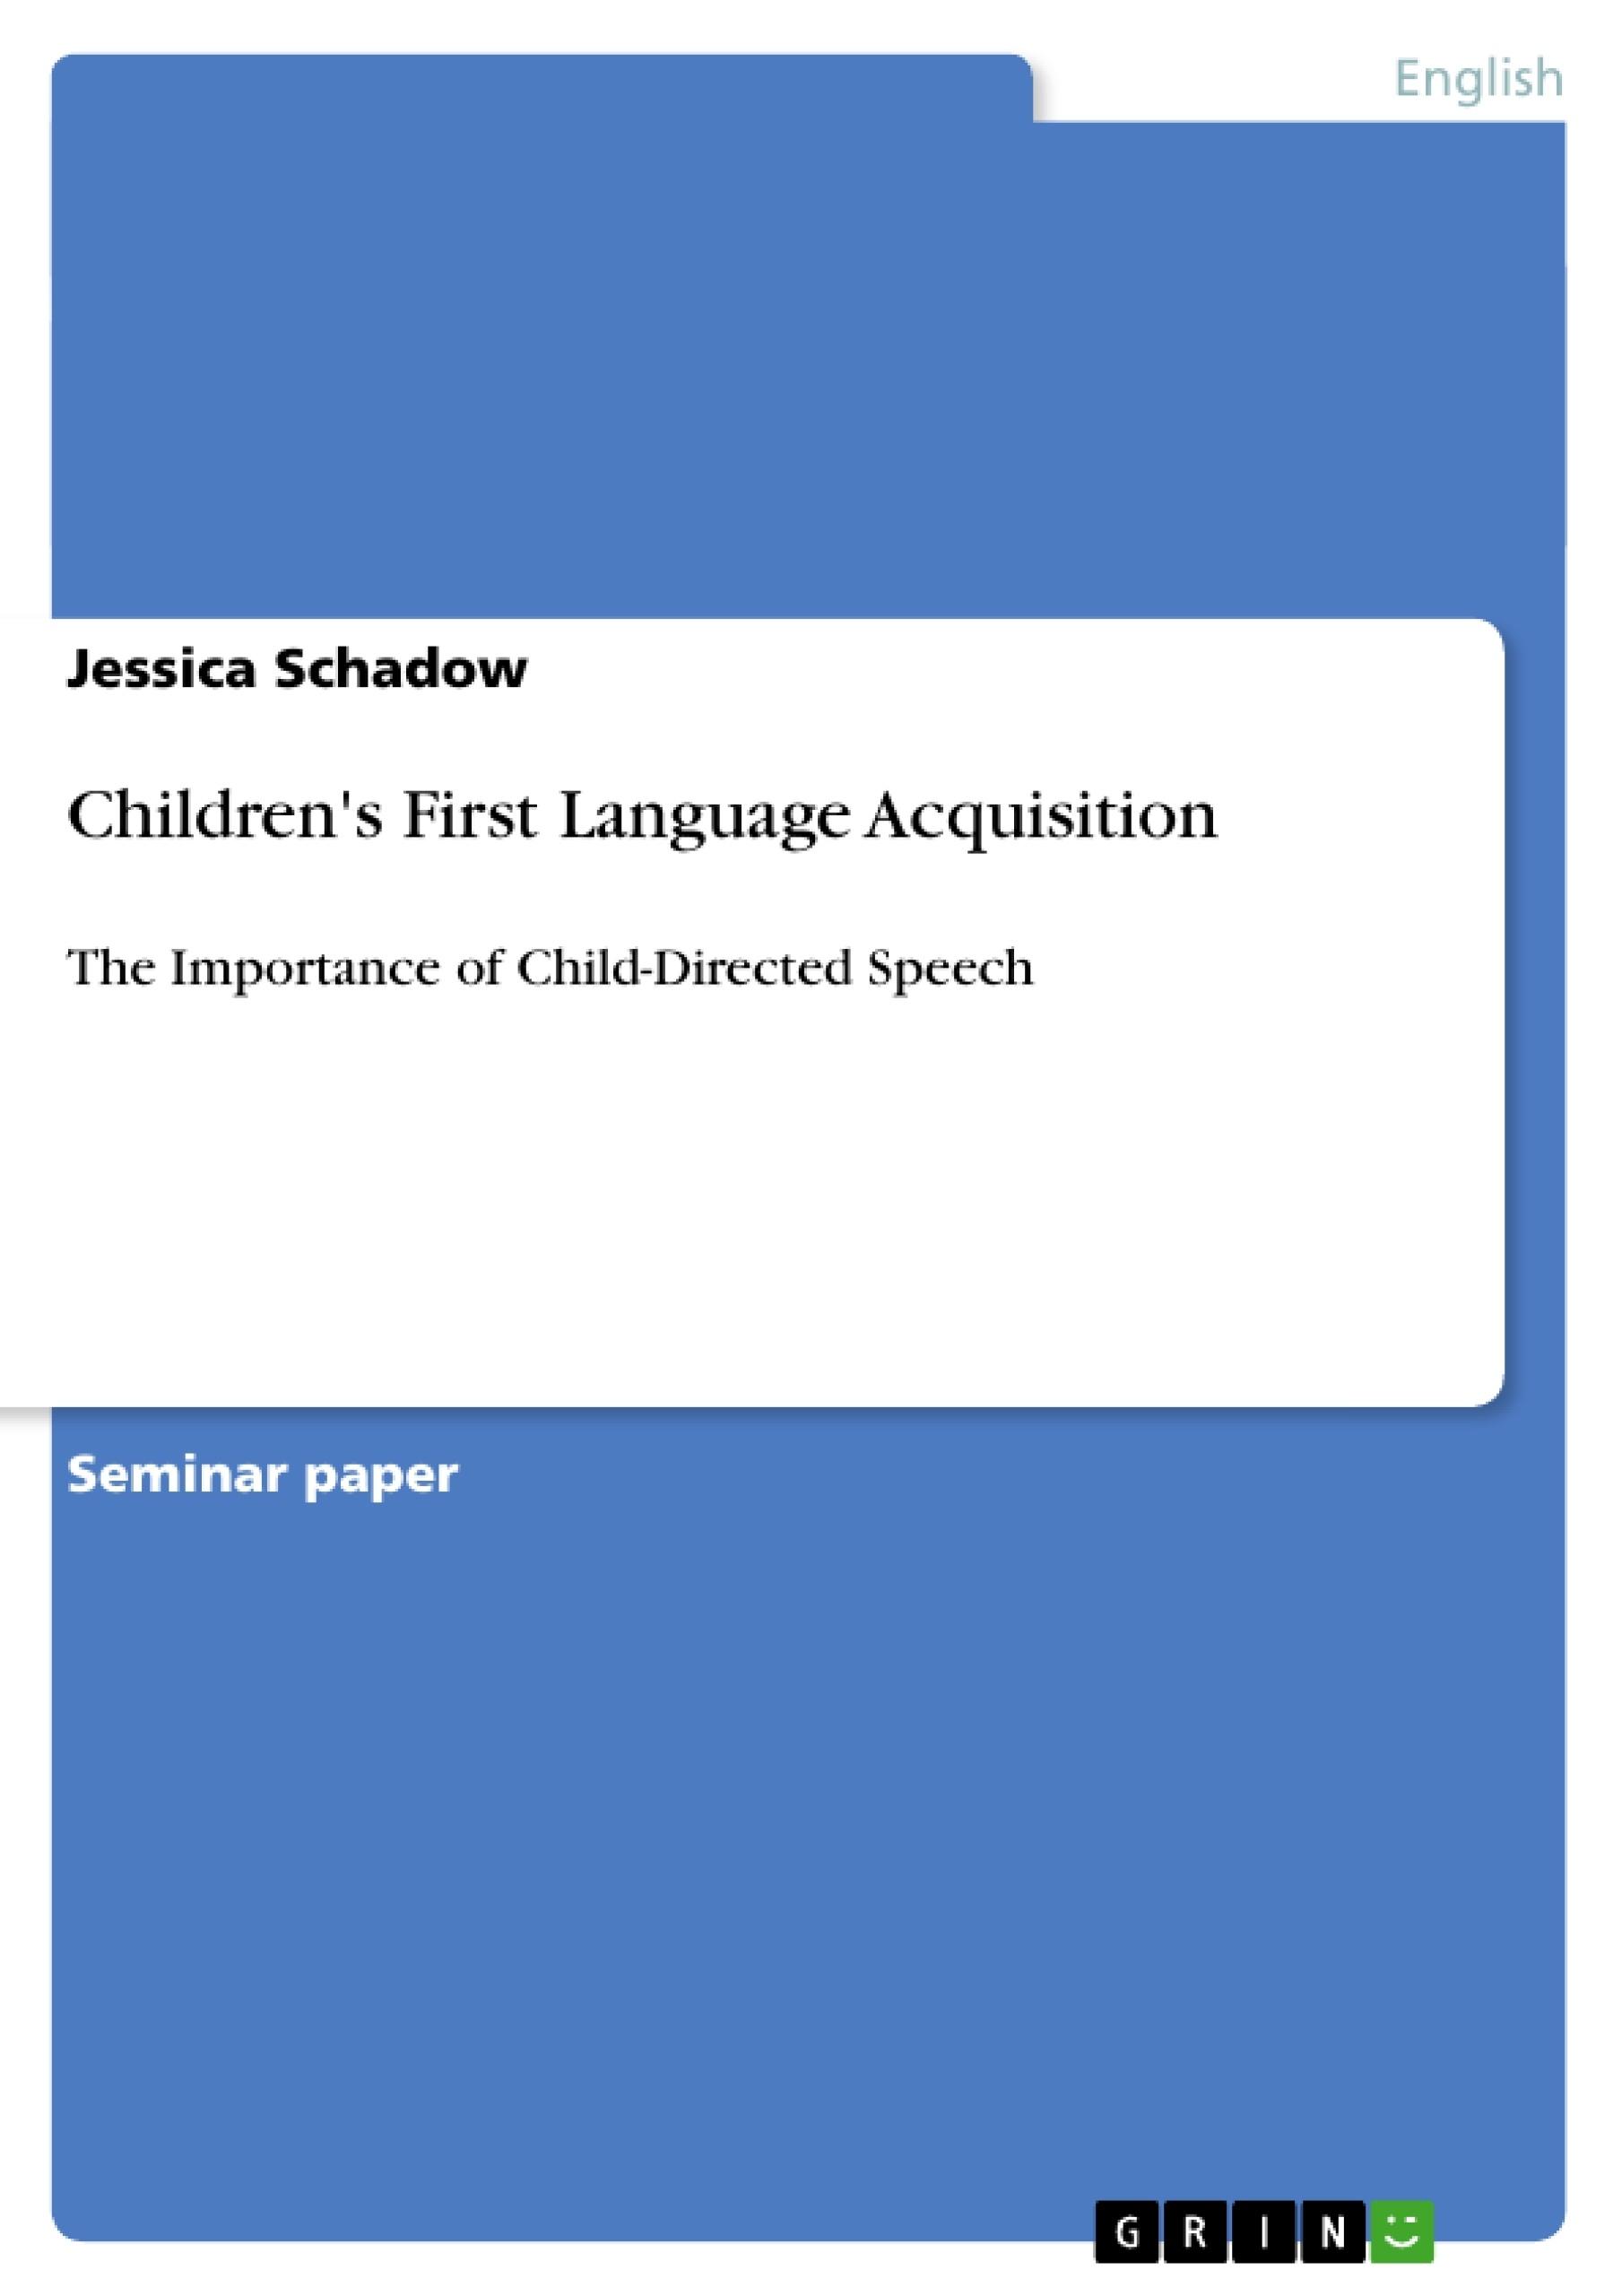 Title: Children's First Language Acquisition